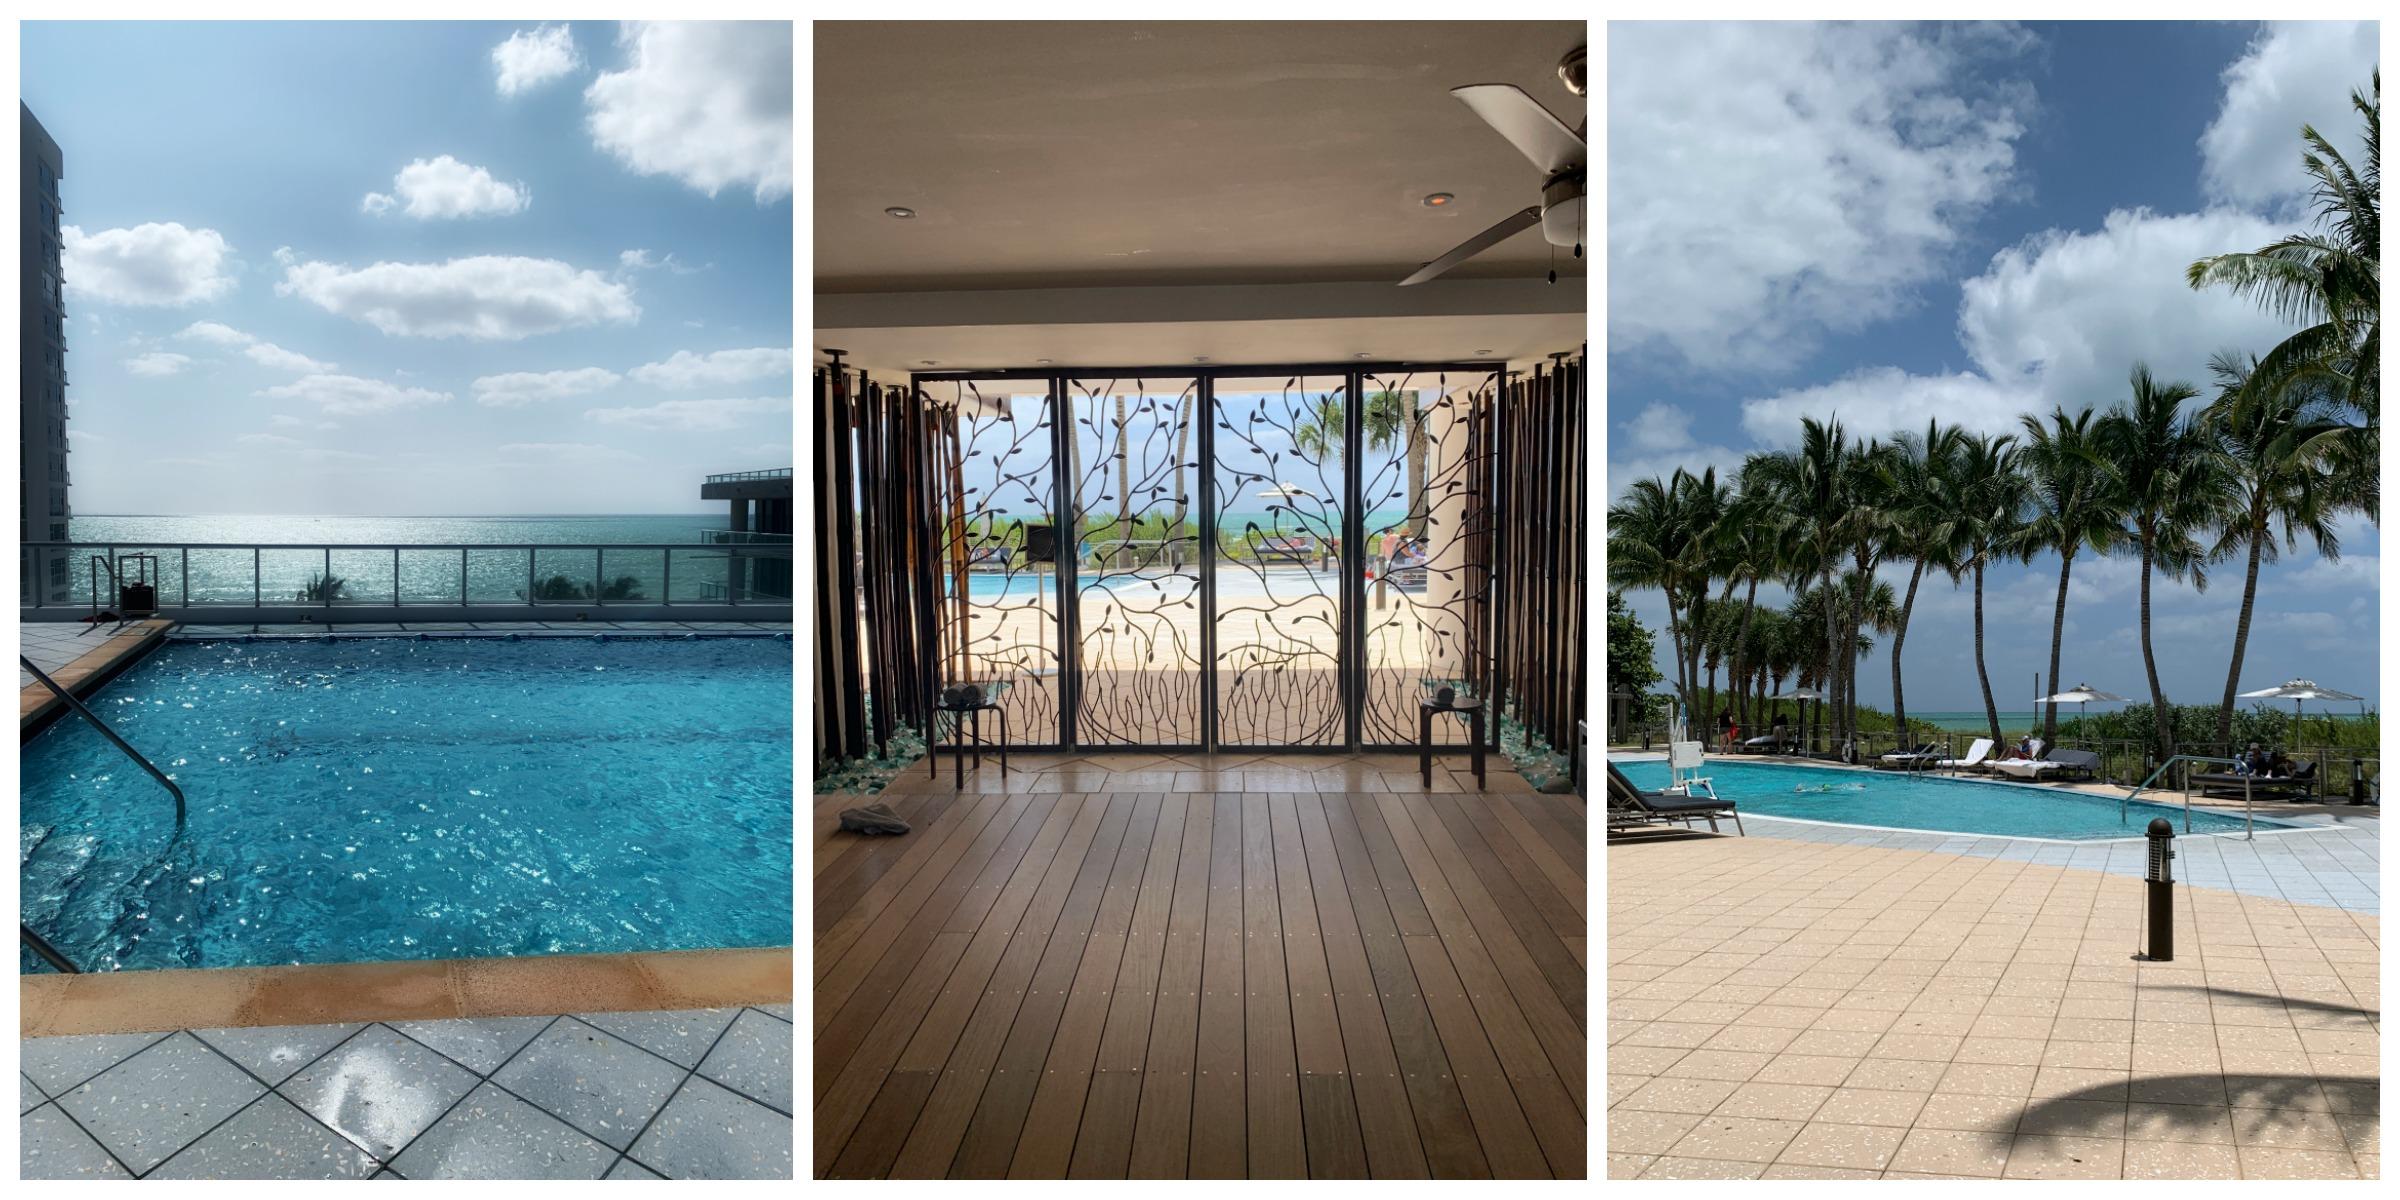 Carillon Wellness Resort Miami Beach